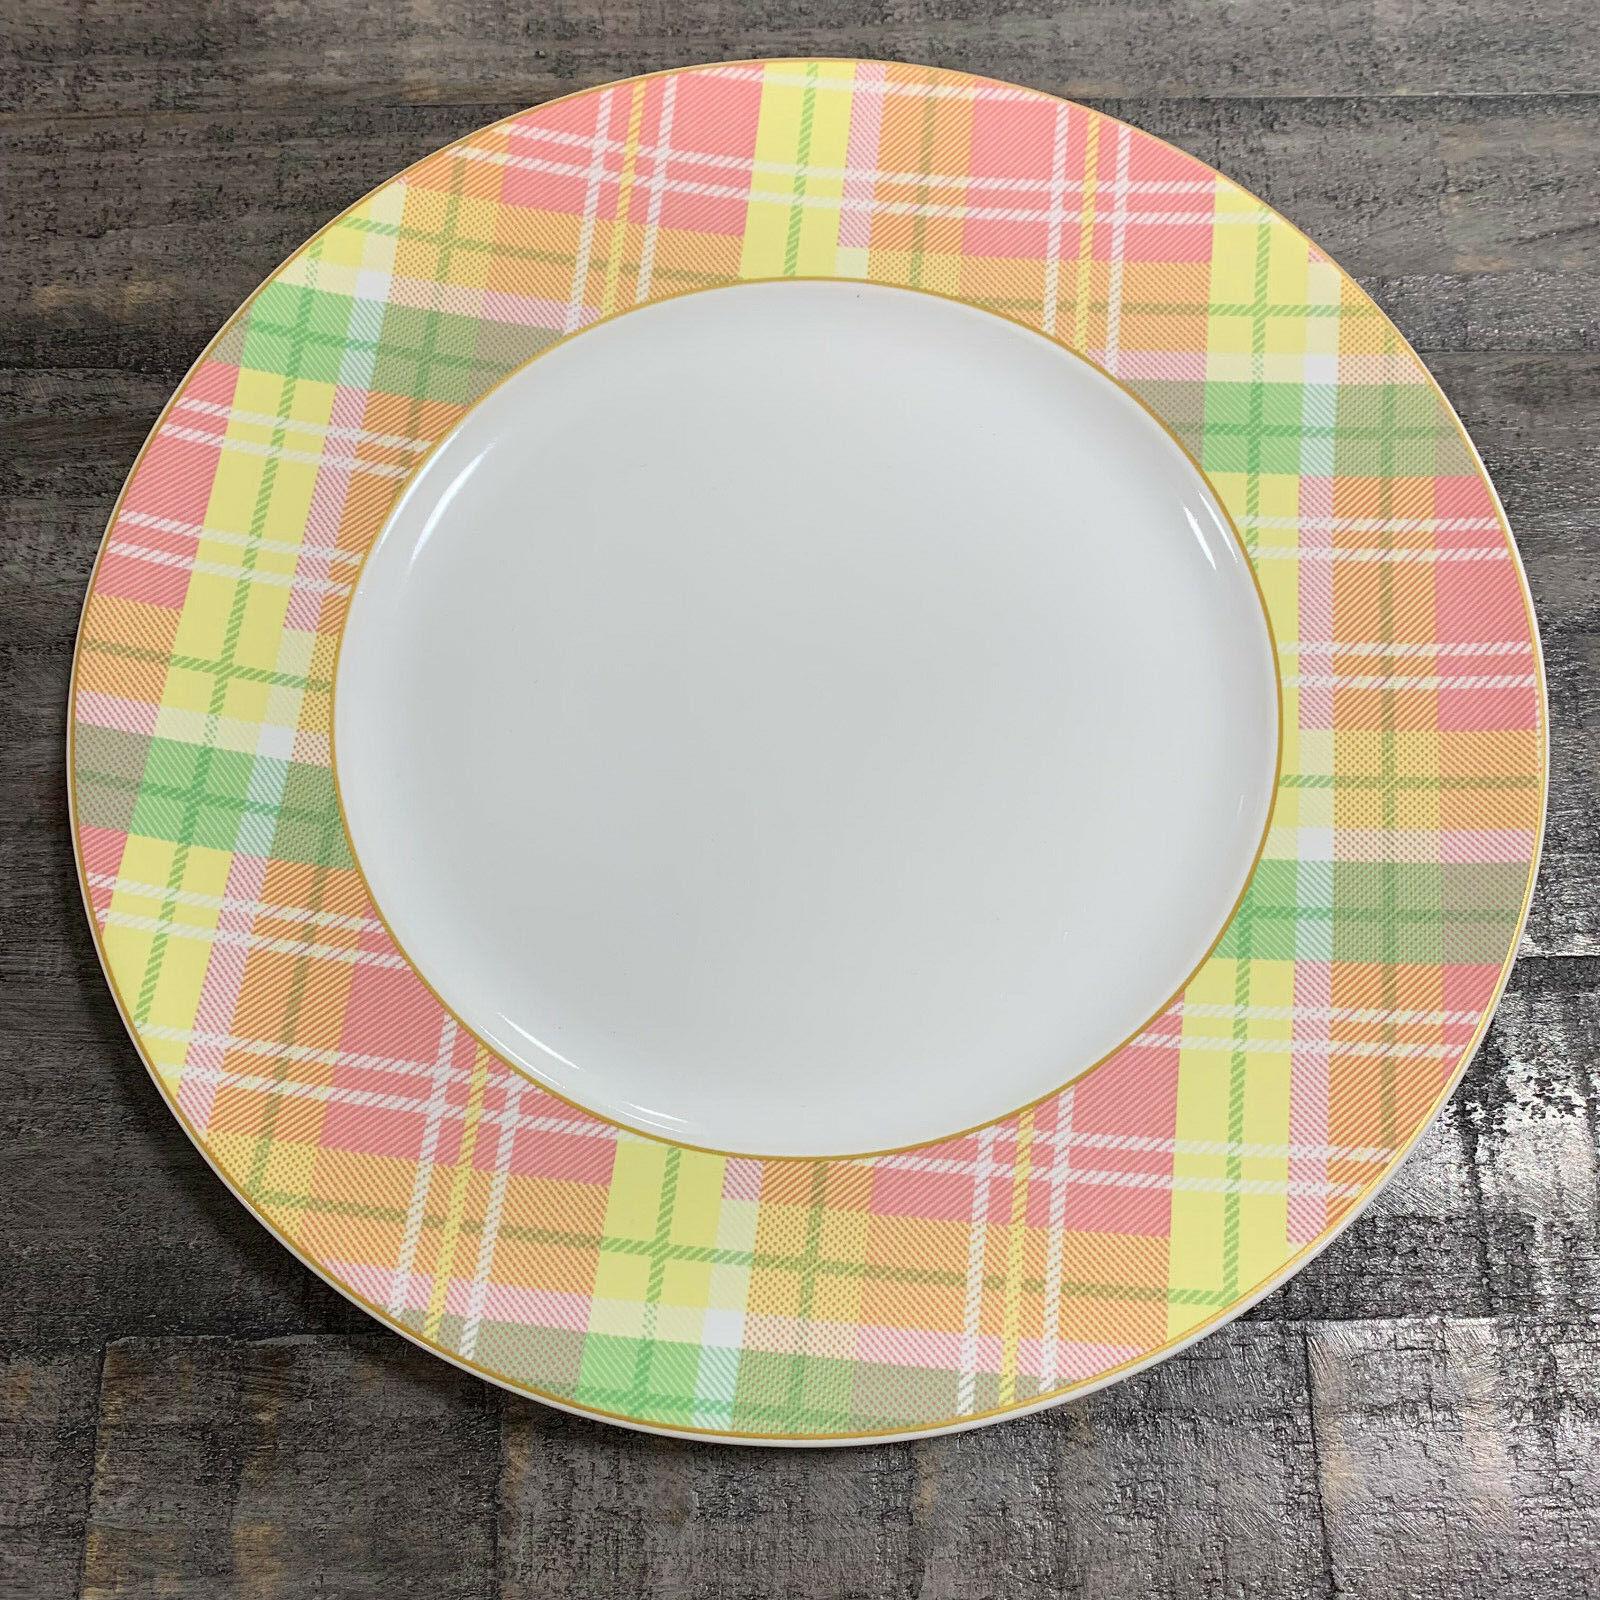 222 Fifth Spring Easter Plaid rose jaune vert Porcelain Dinner Plates Set of 4